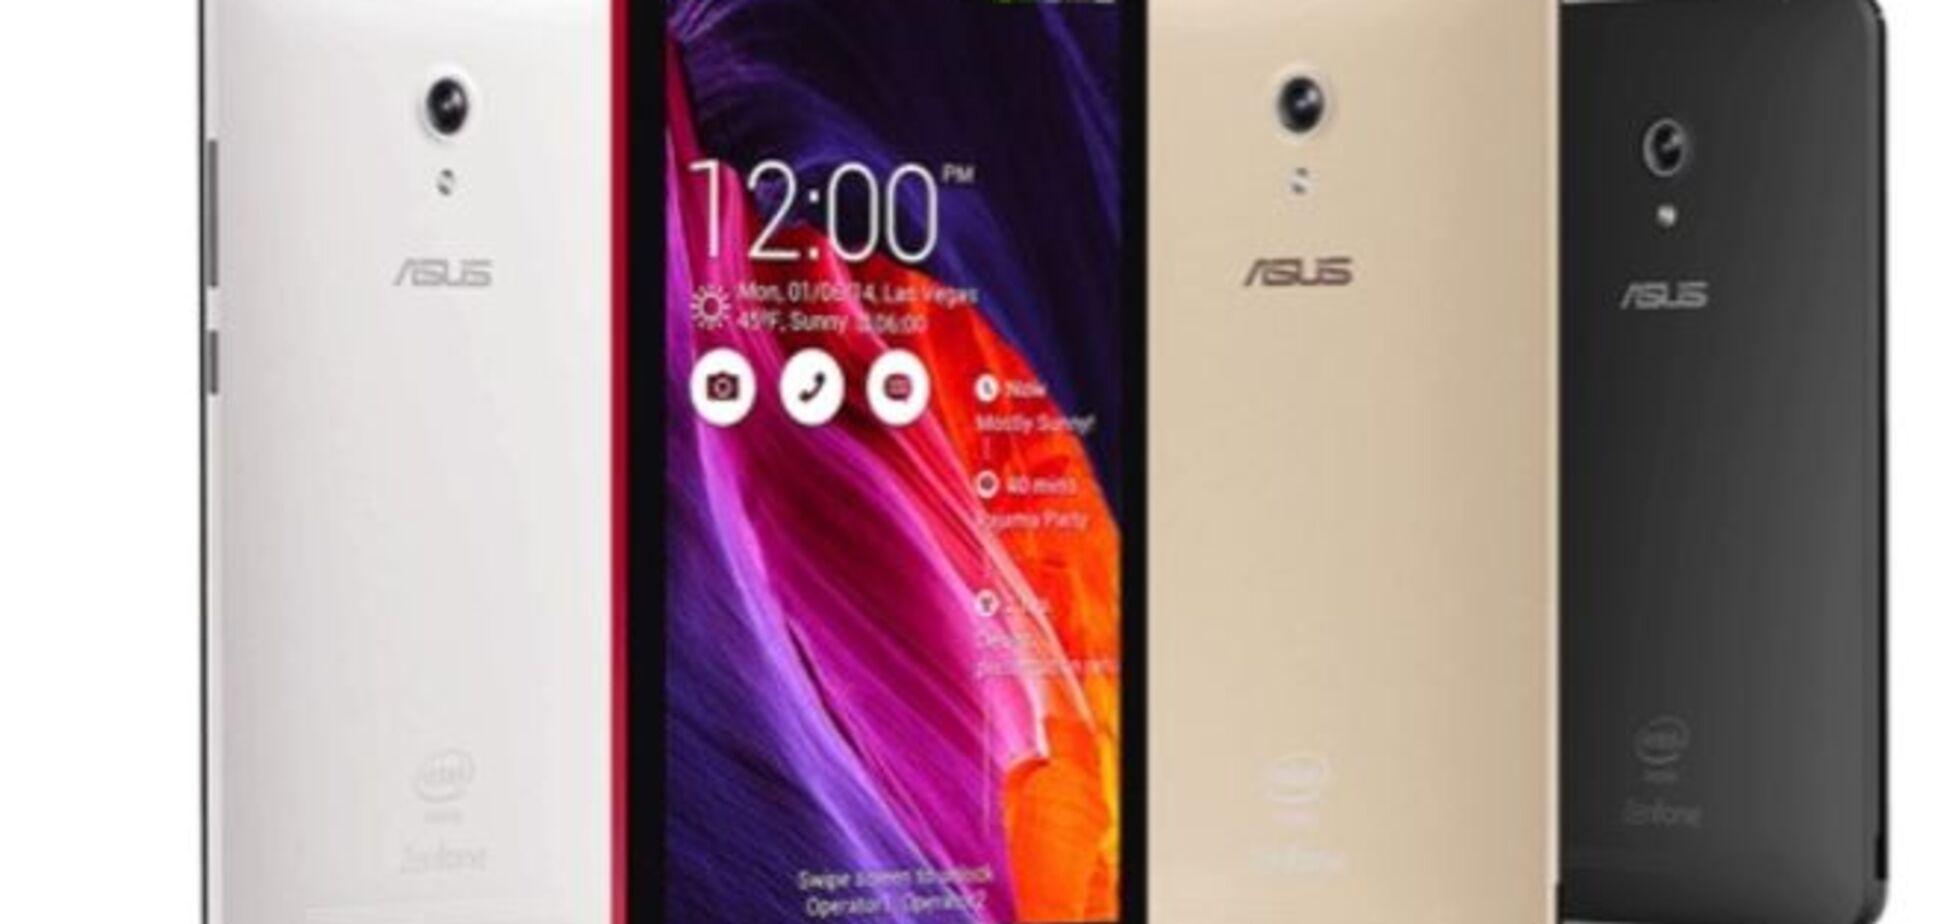 Asus ZenFone обновились до последней версии Android